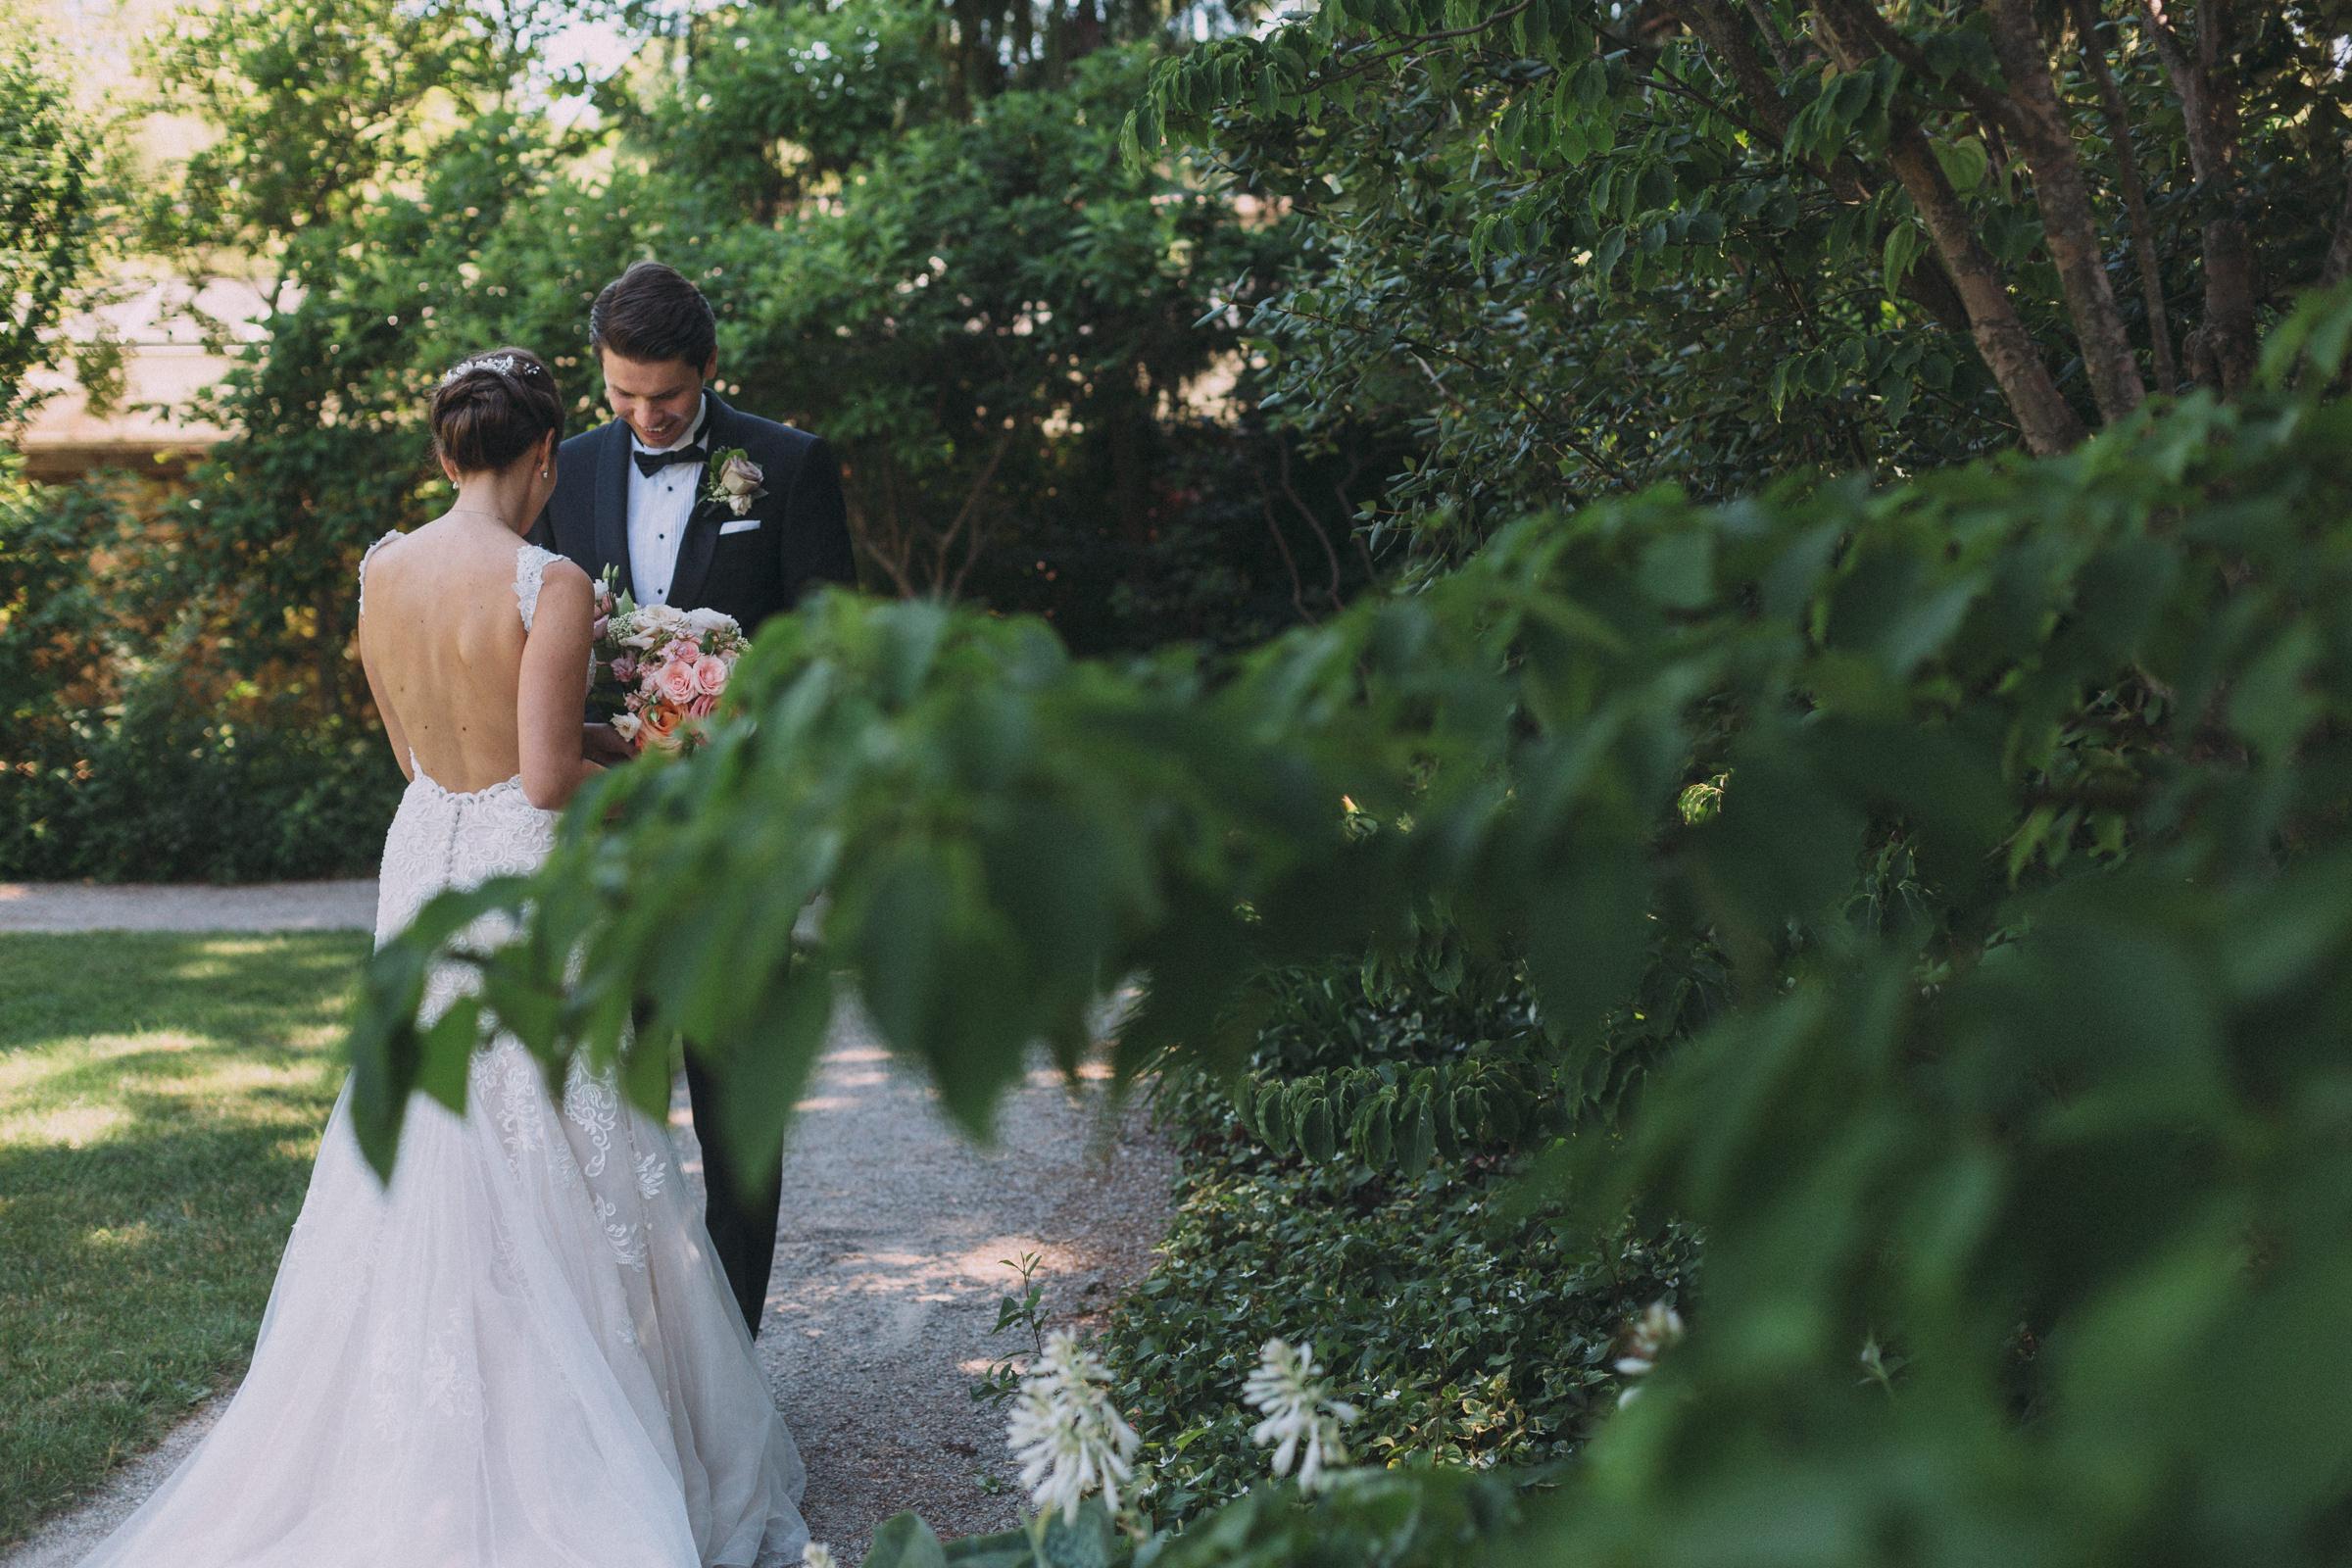 Langdon-Hall-wedding-photography-Cambridge-by-Sam-Wong-of-Visual-Cravings_Sarah-Ryan_18.jpg